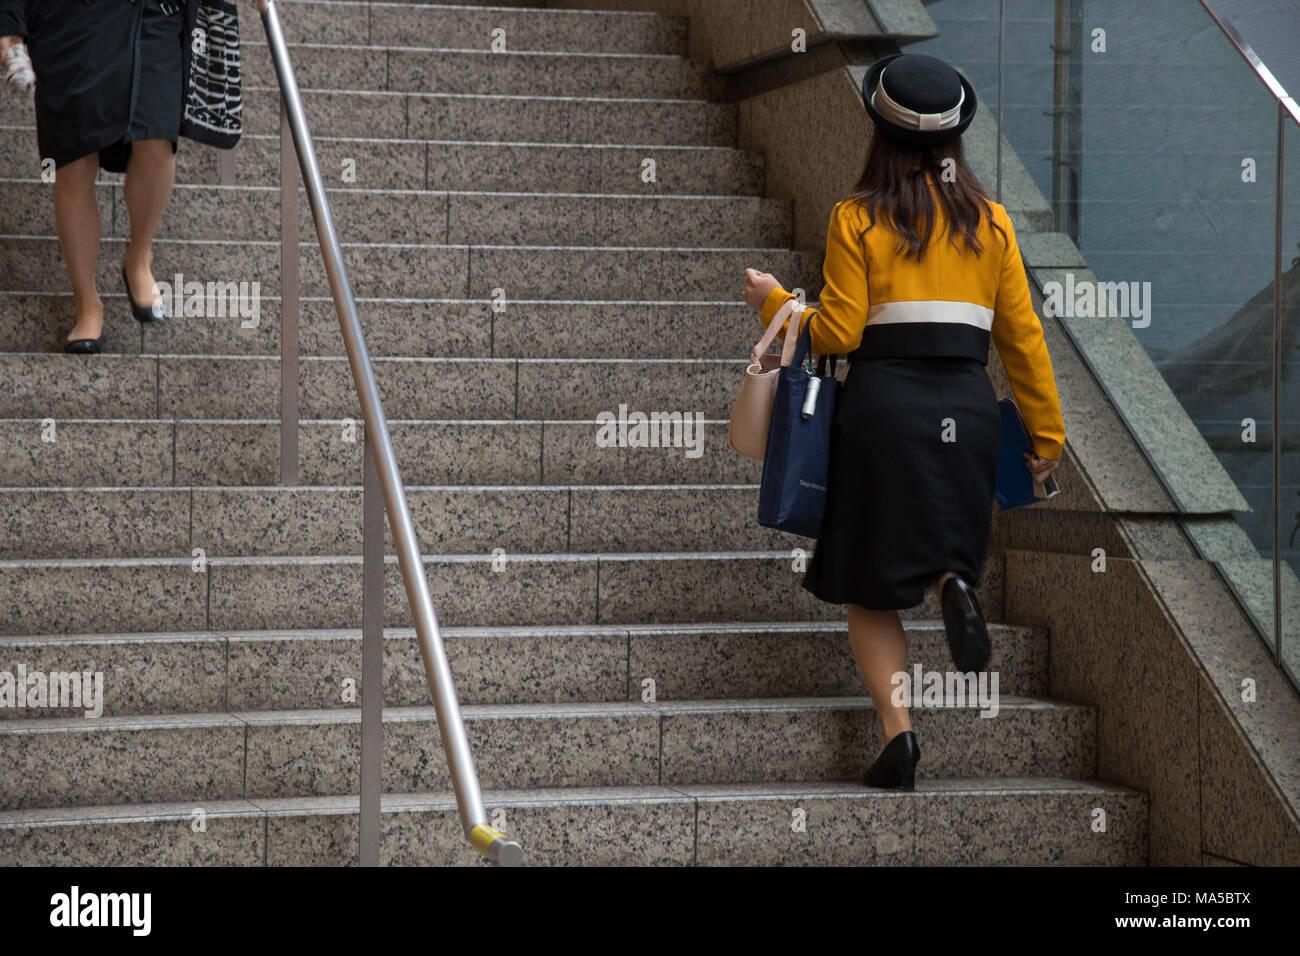 Asia, Japan, Nihon, Nippon, Tokyo, Marunouchi, Chiyoda, Tokyo International Forum, woman on stairs - Stock Image